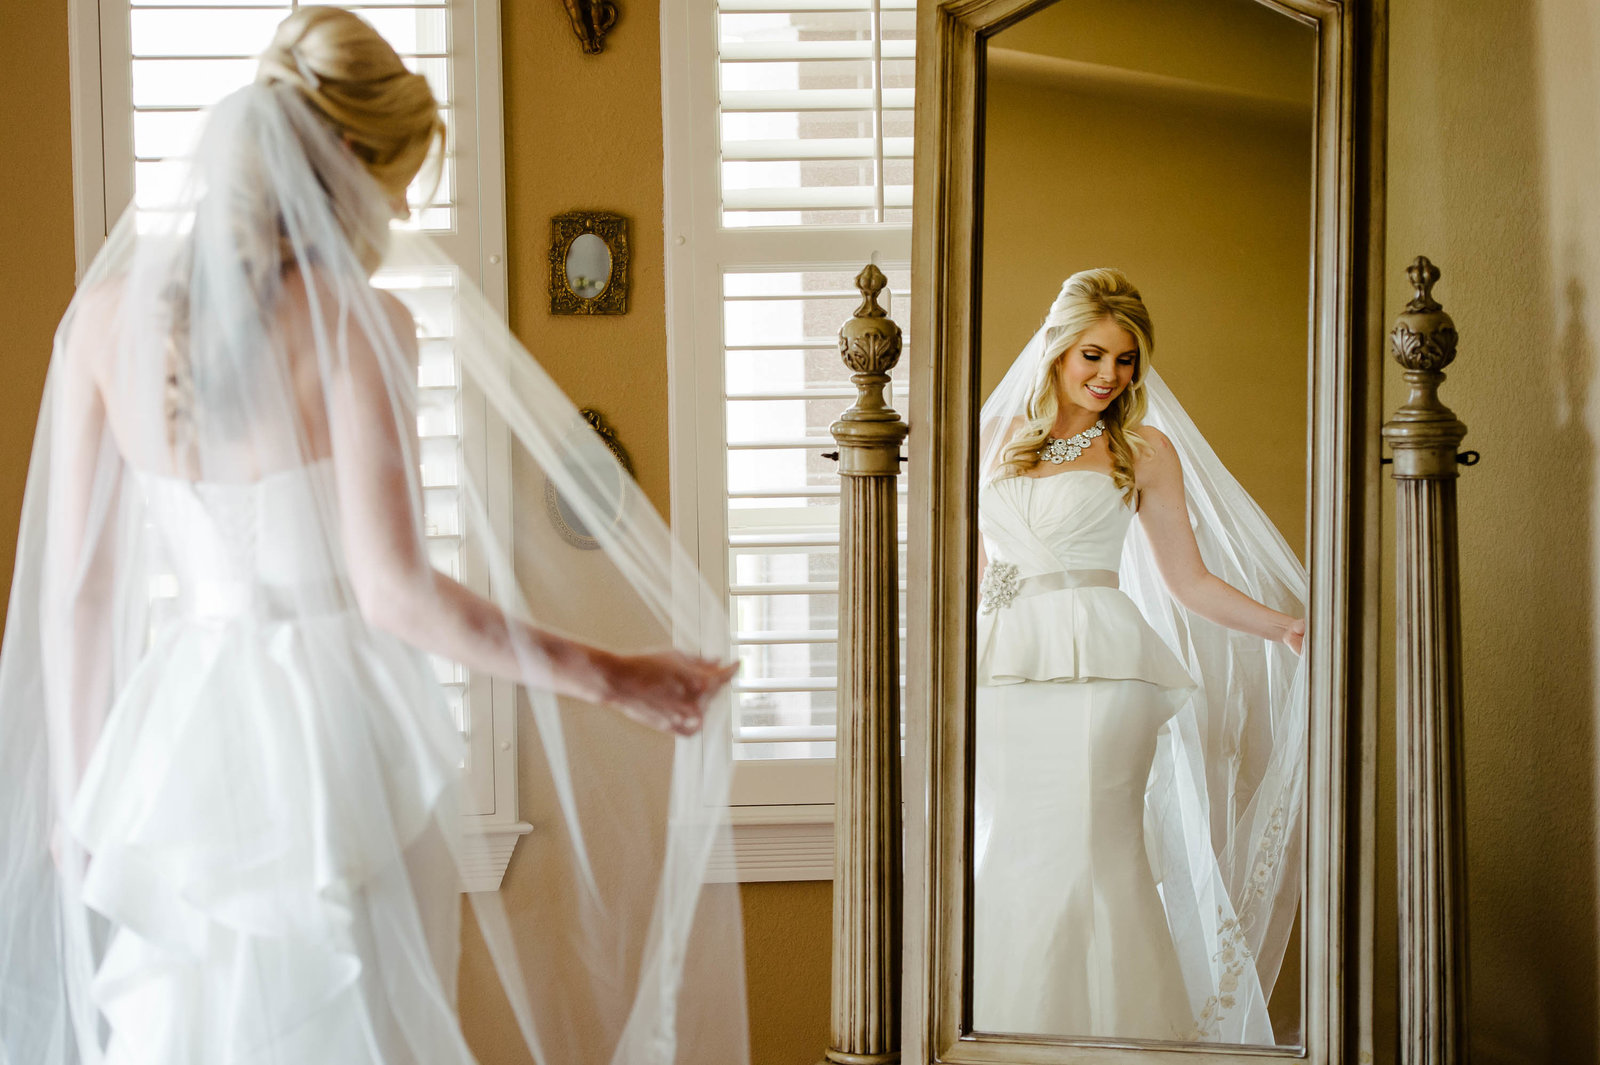 311-El-paso-wedding-photographer-El Paso Wedding Photographer_B06